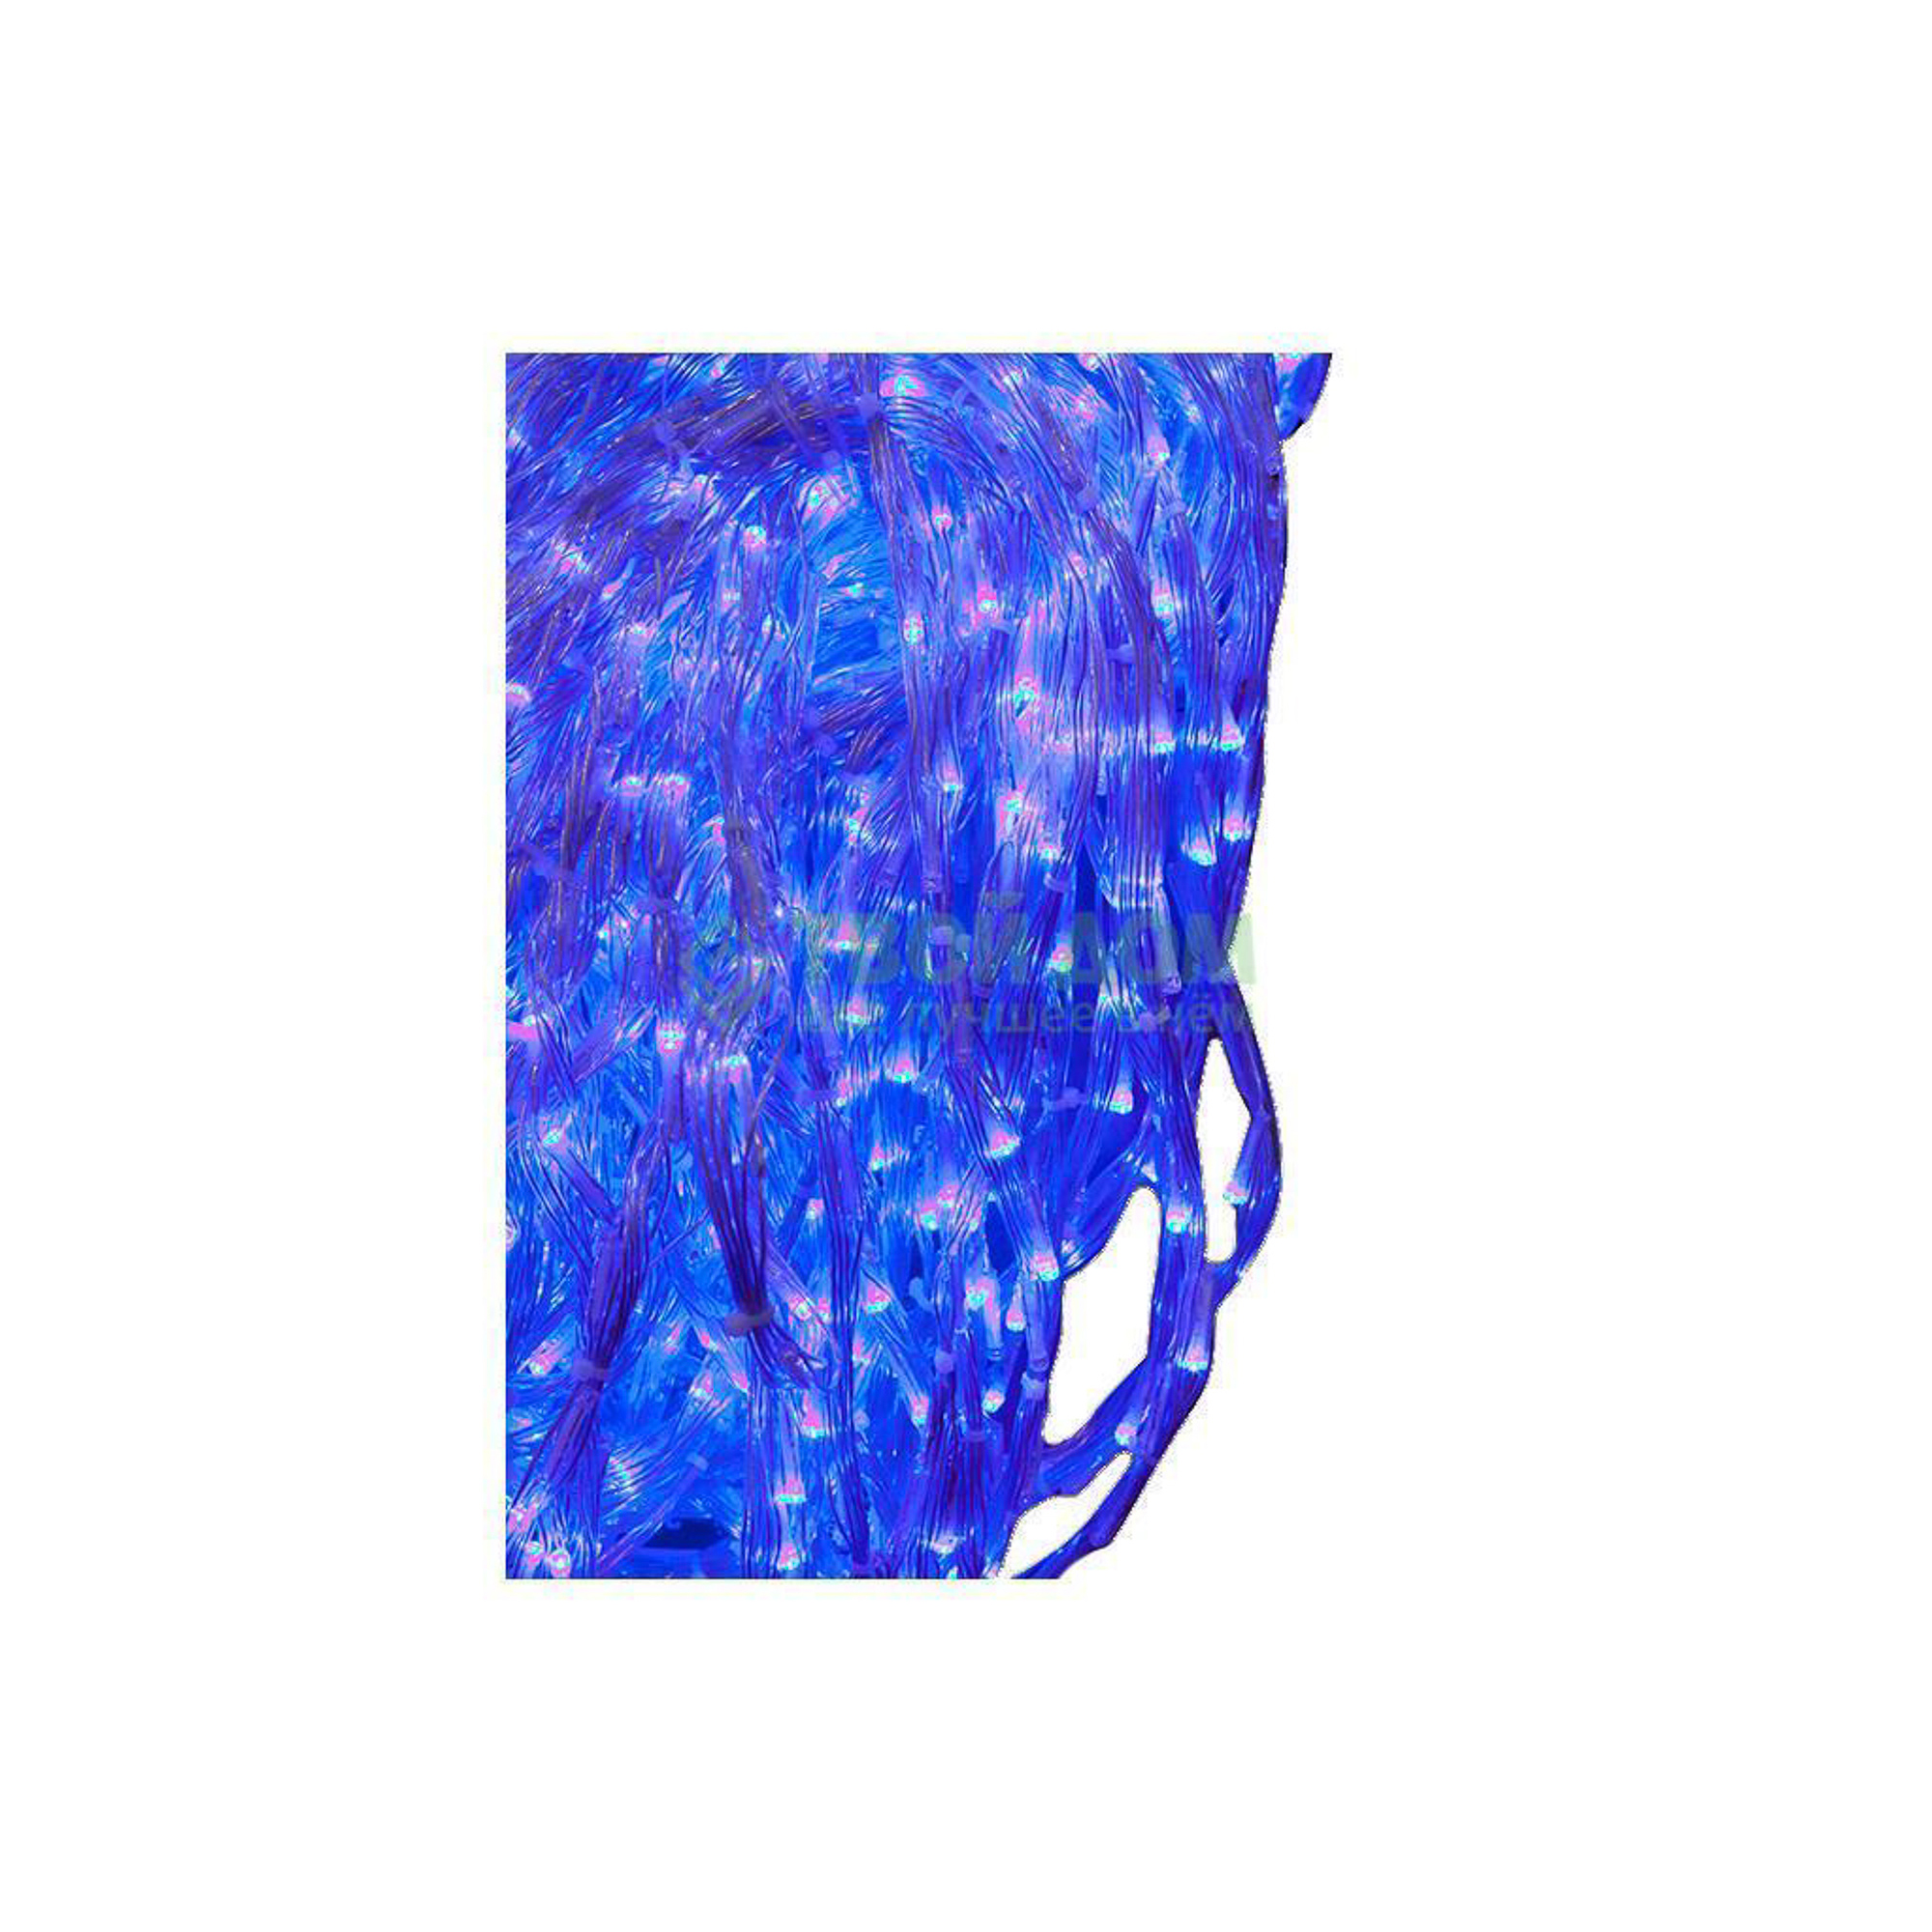 Электрогирлянда фонтан Kms уличная 19 м голубой (L1631-195760BO)